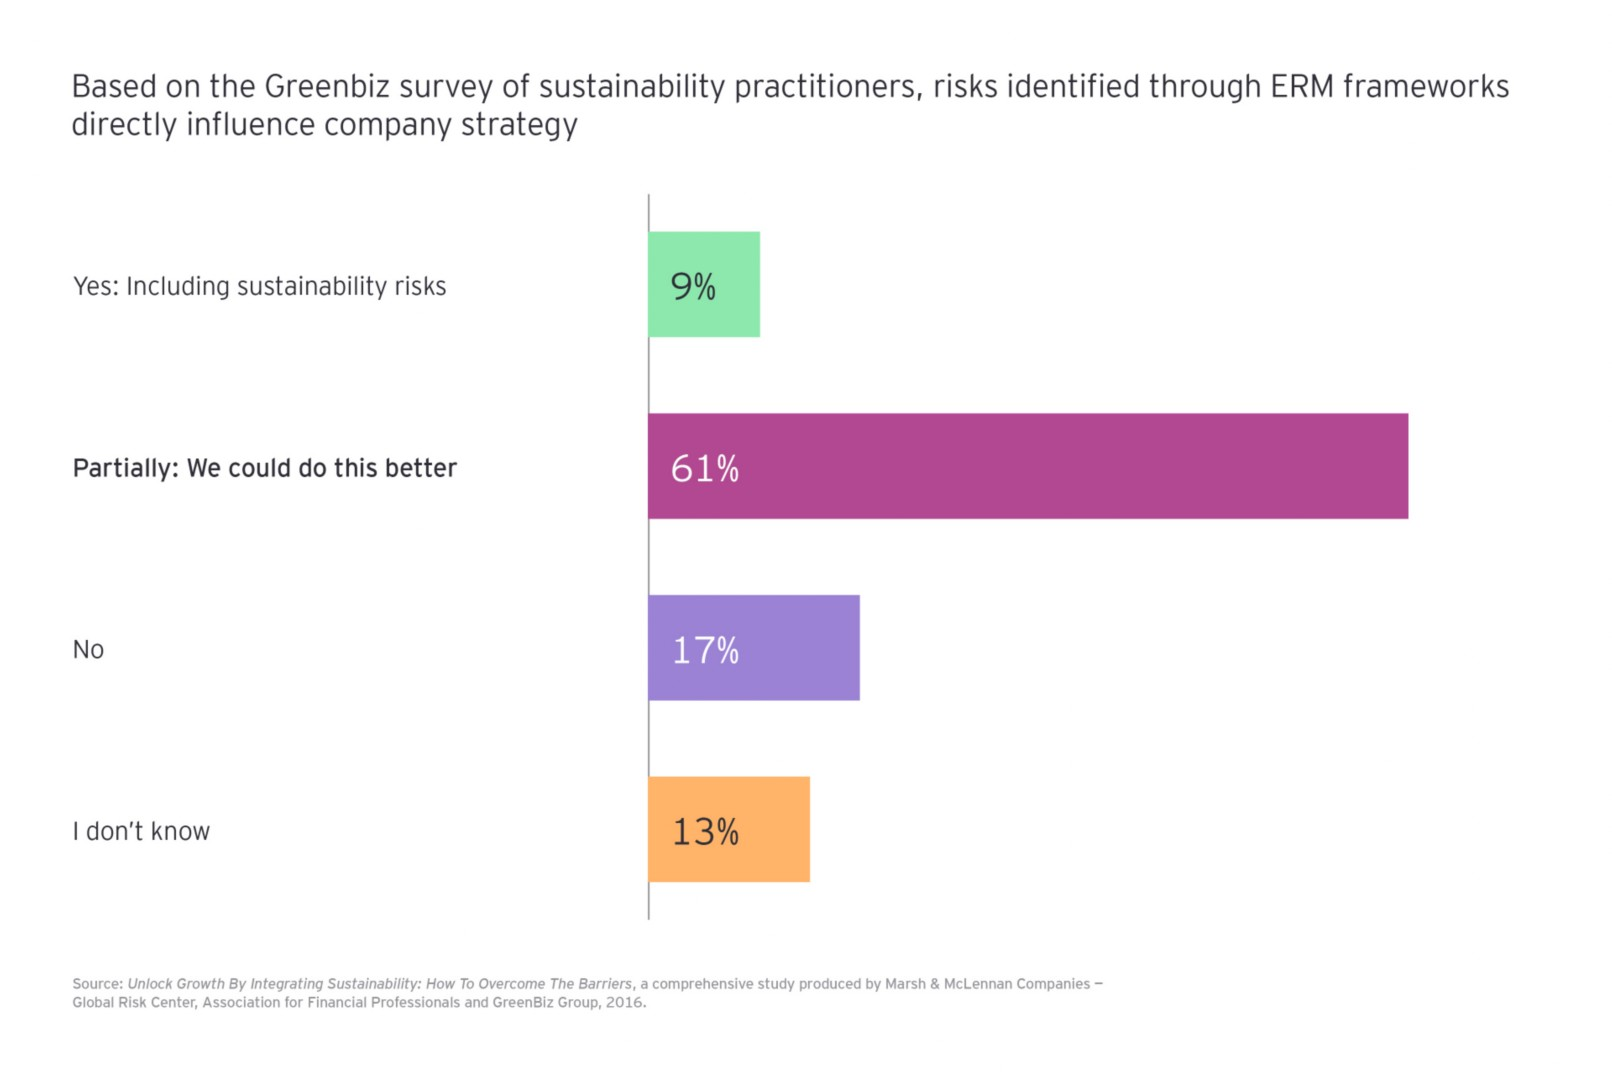 ERM frameworks